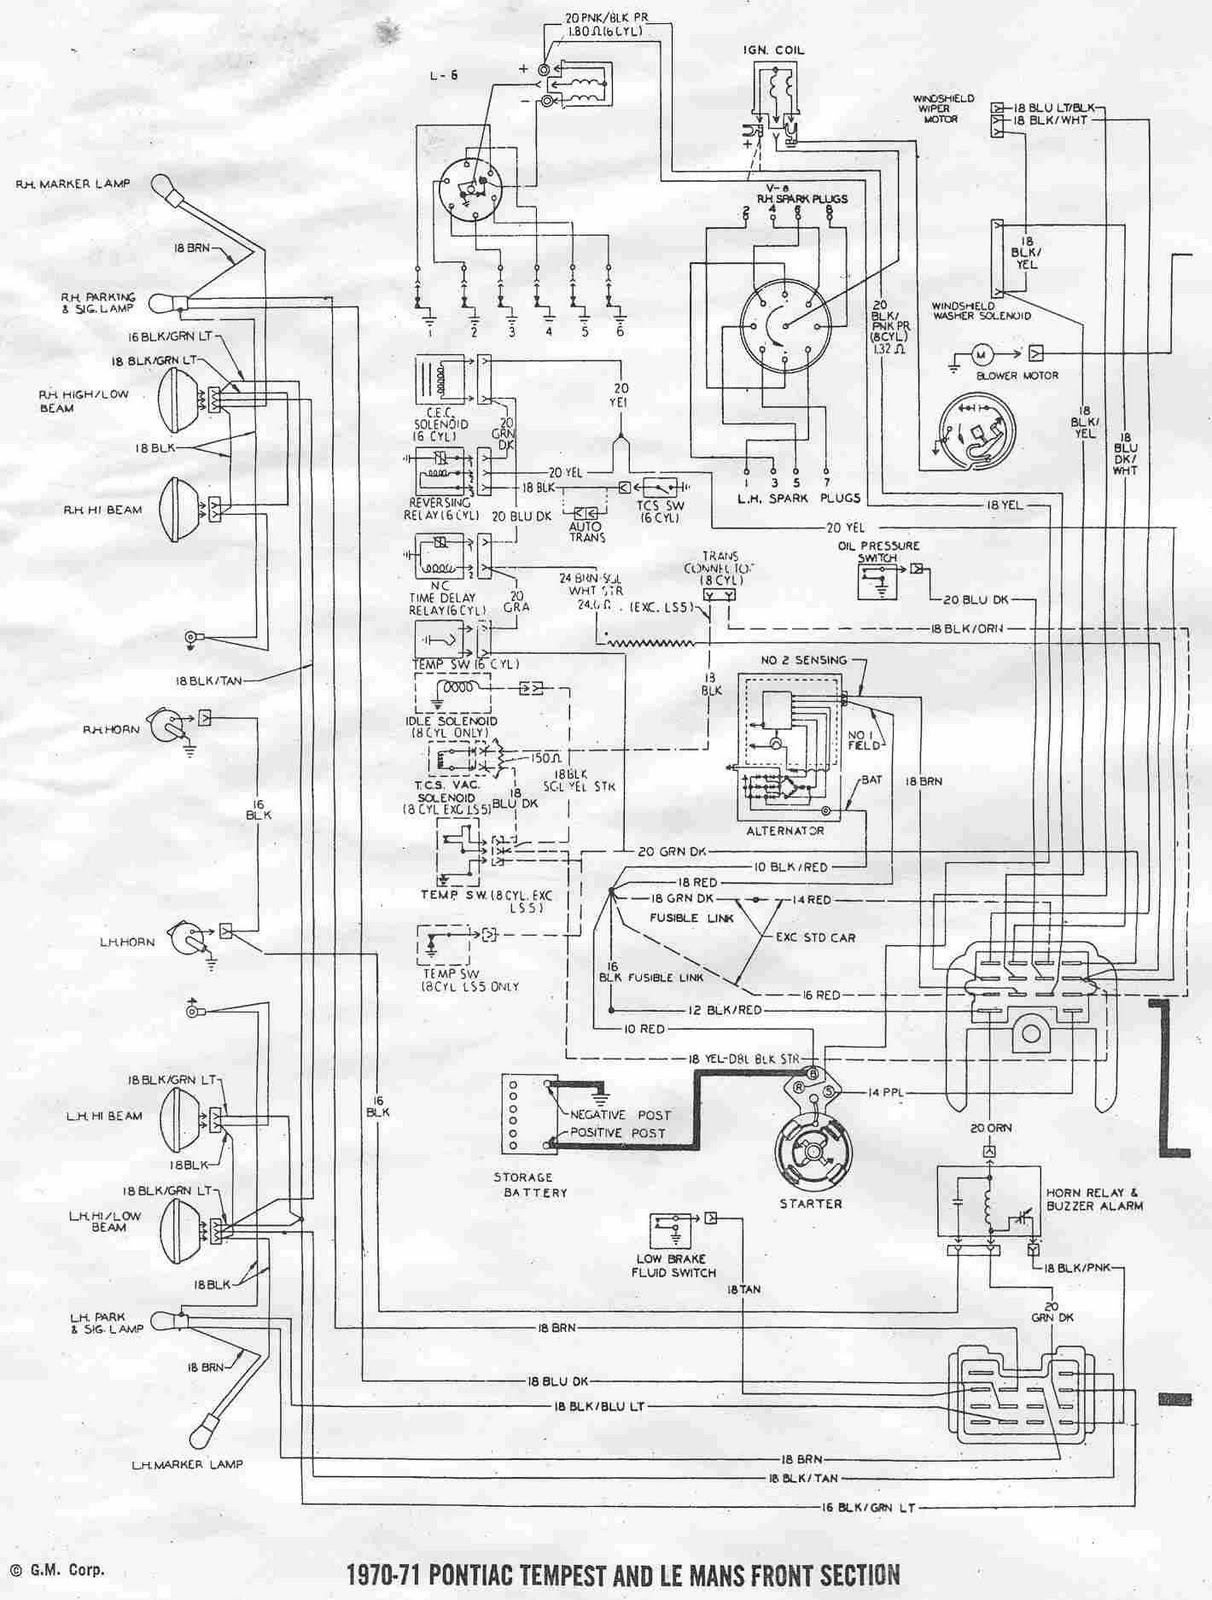 1966 le mans wiring diagram